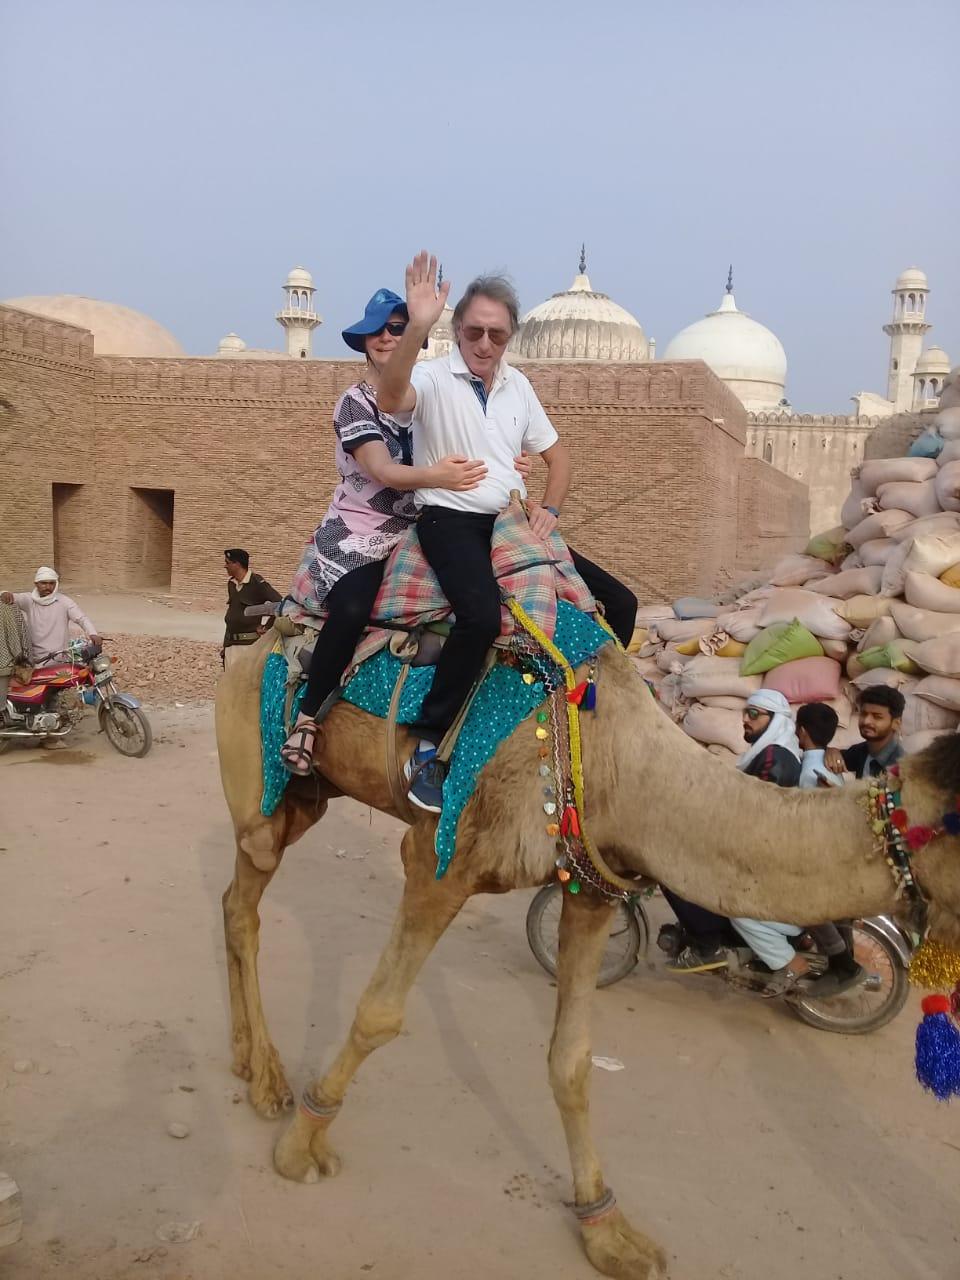 [Camel ride]